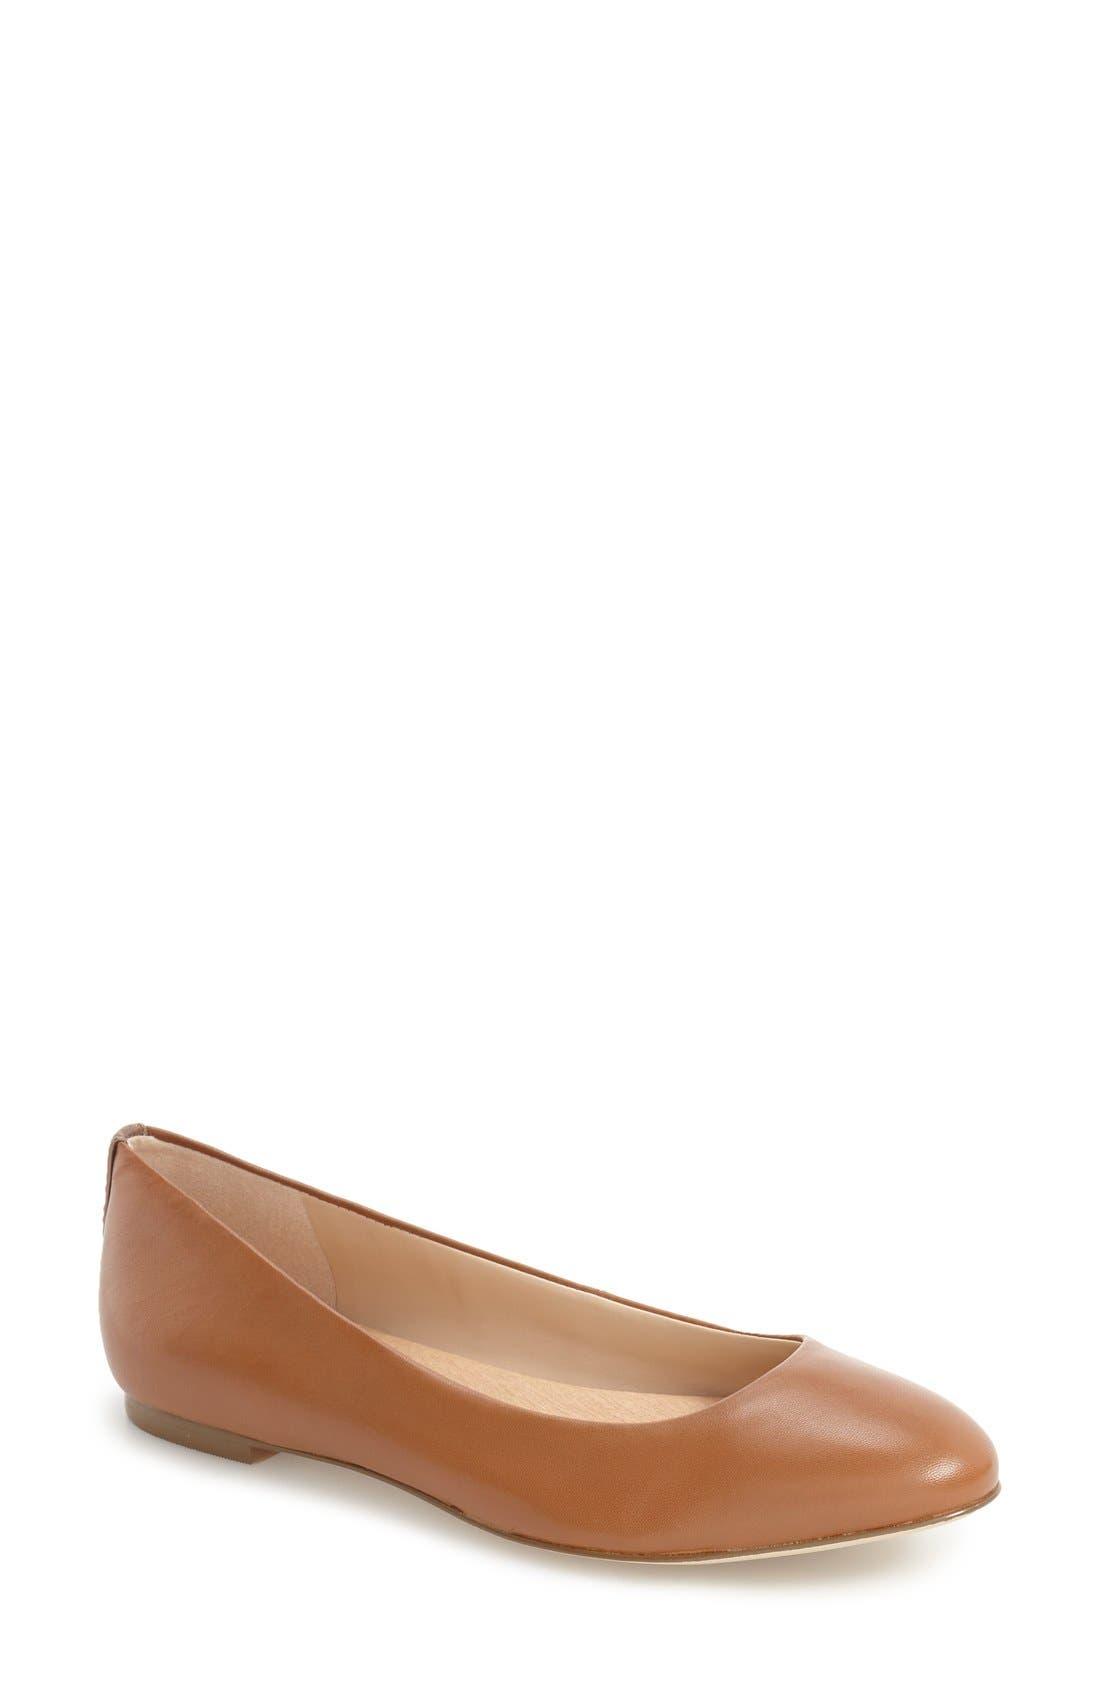 Vixen Ballet Flat,                             Main thumbnail 1, color,                             Saddle Leather